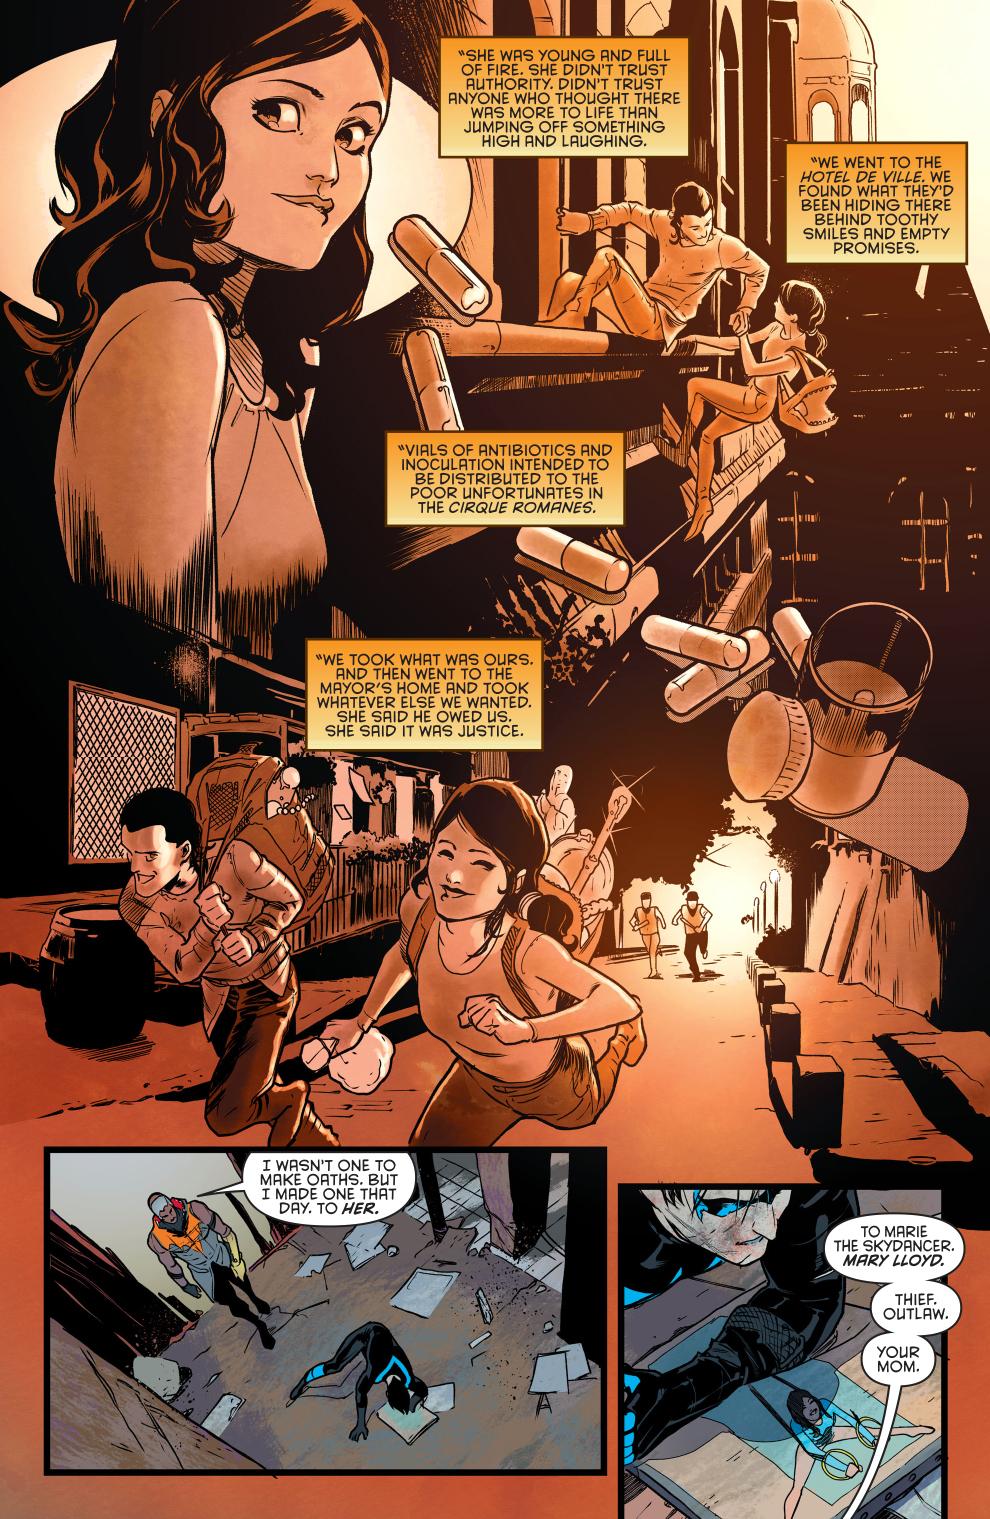 Why Raptor Loves Nightwing's Mom